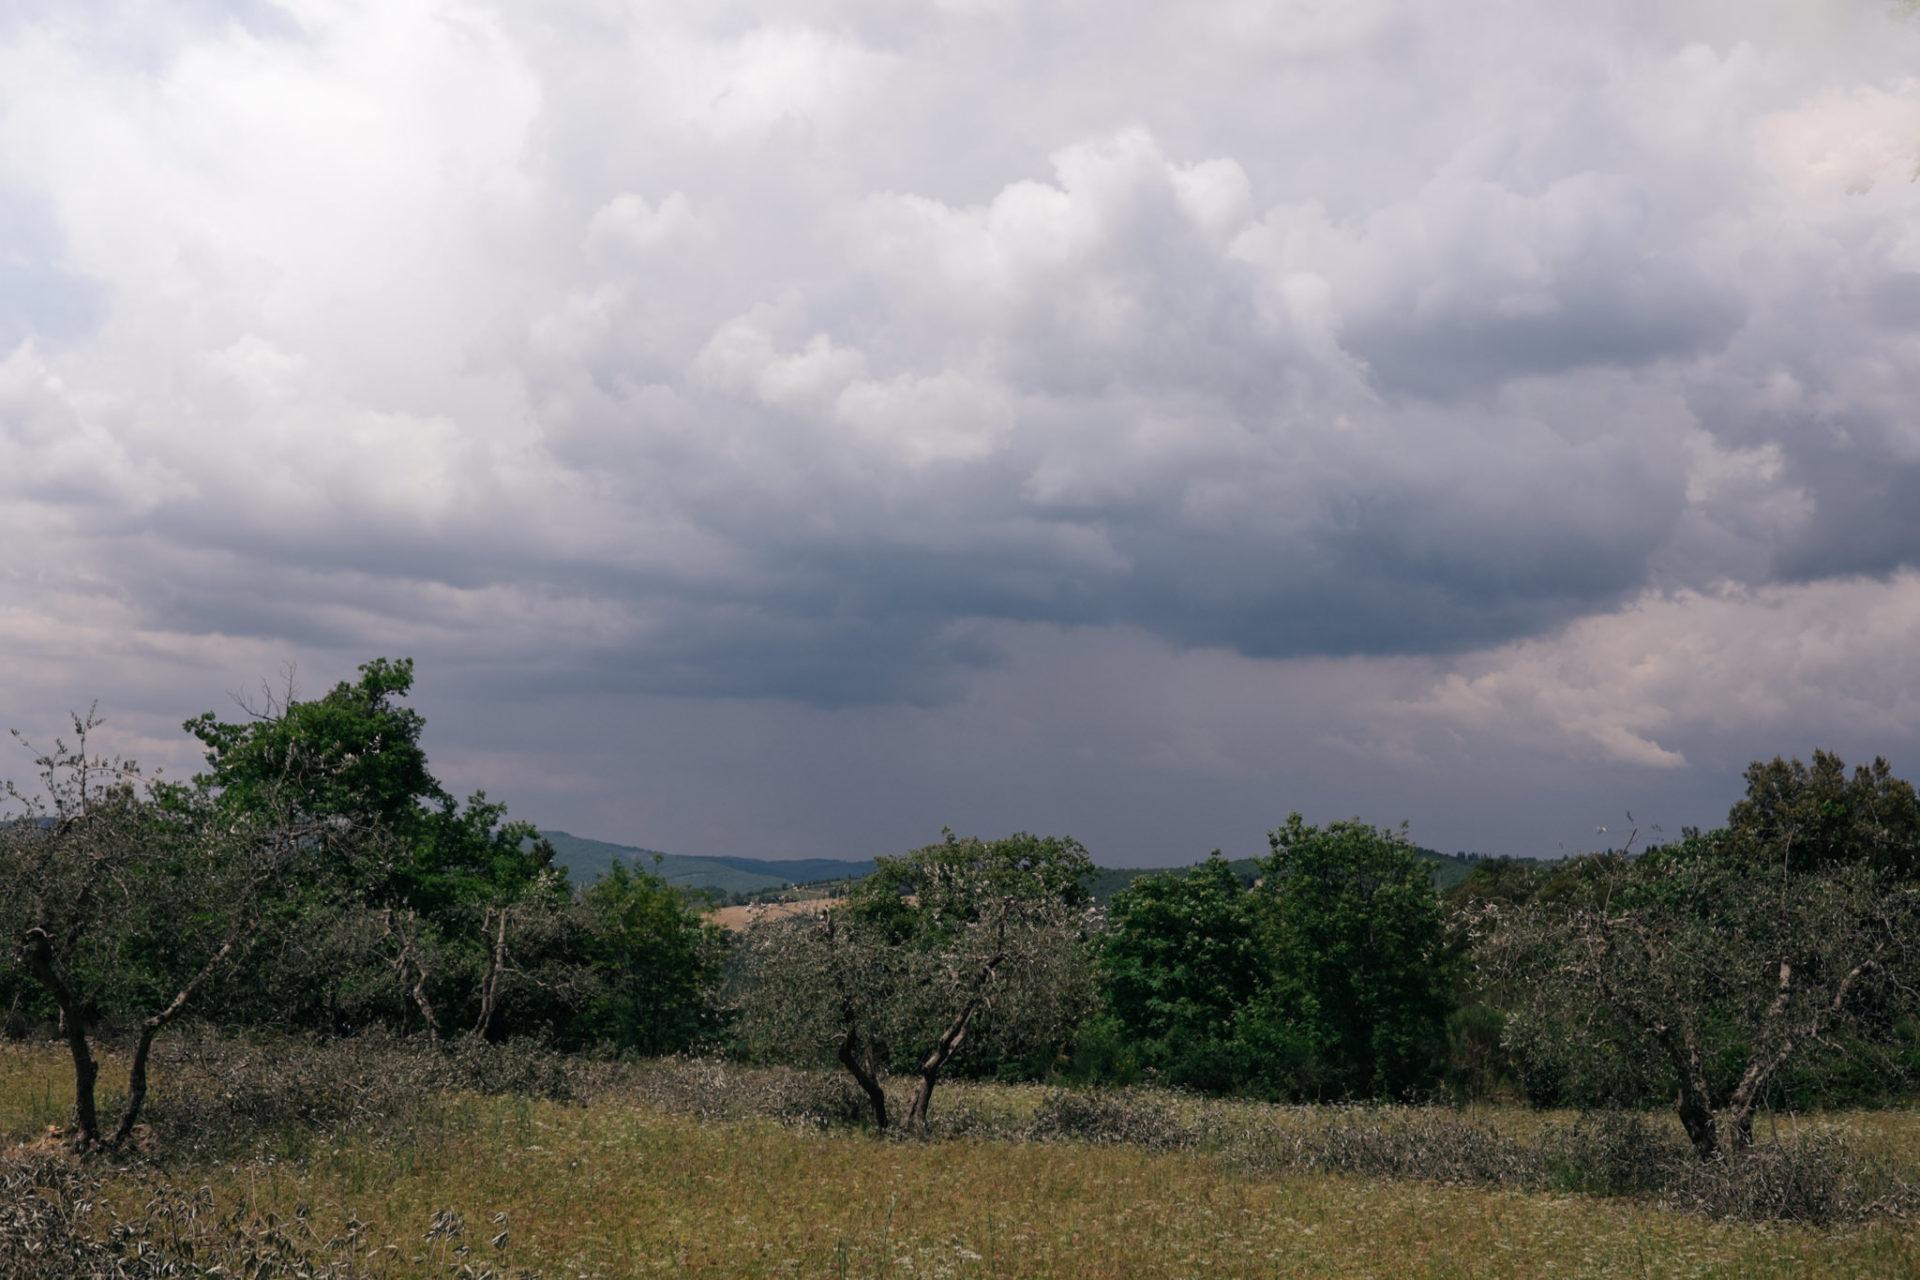 wedding photographer tuscany-italy road trip with dog-chianti region hiking